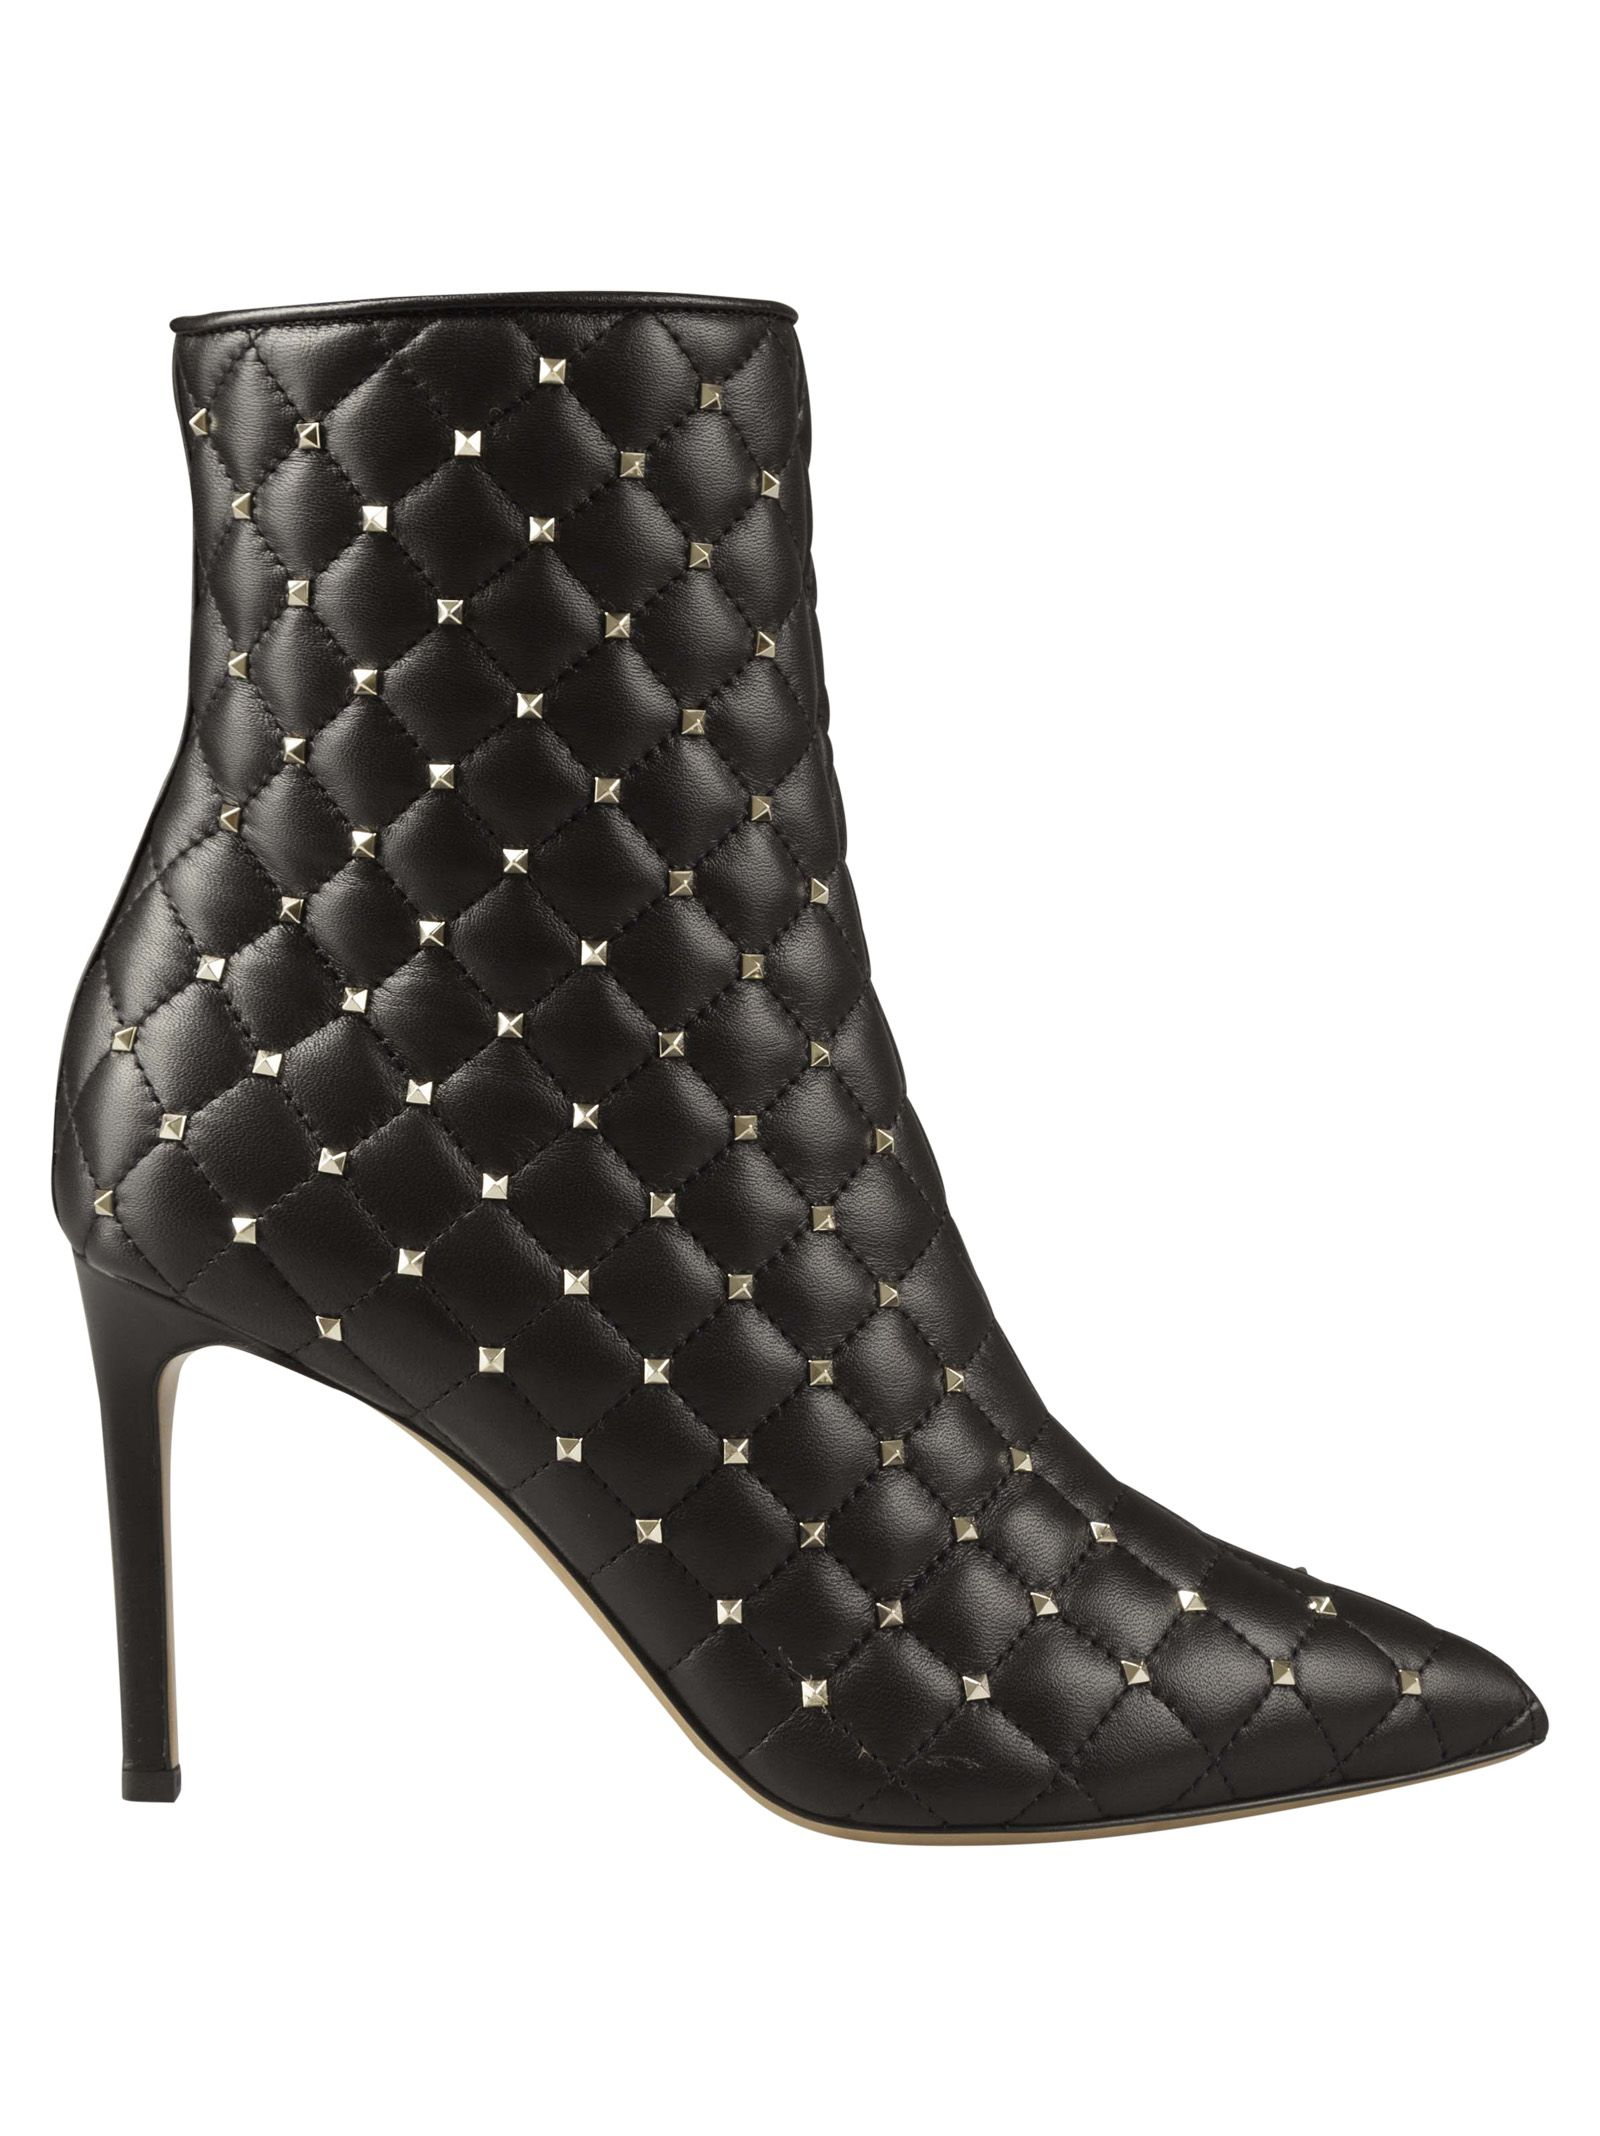 Valentino Garavani Rockstud Spike Ankle Boots